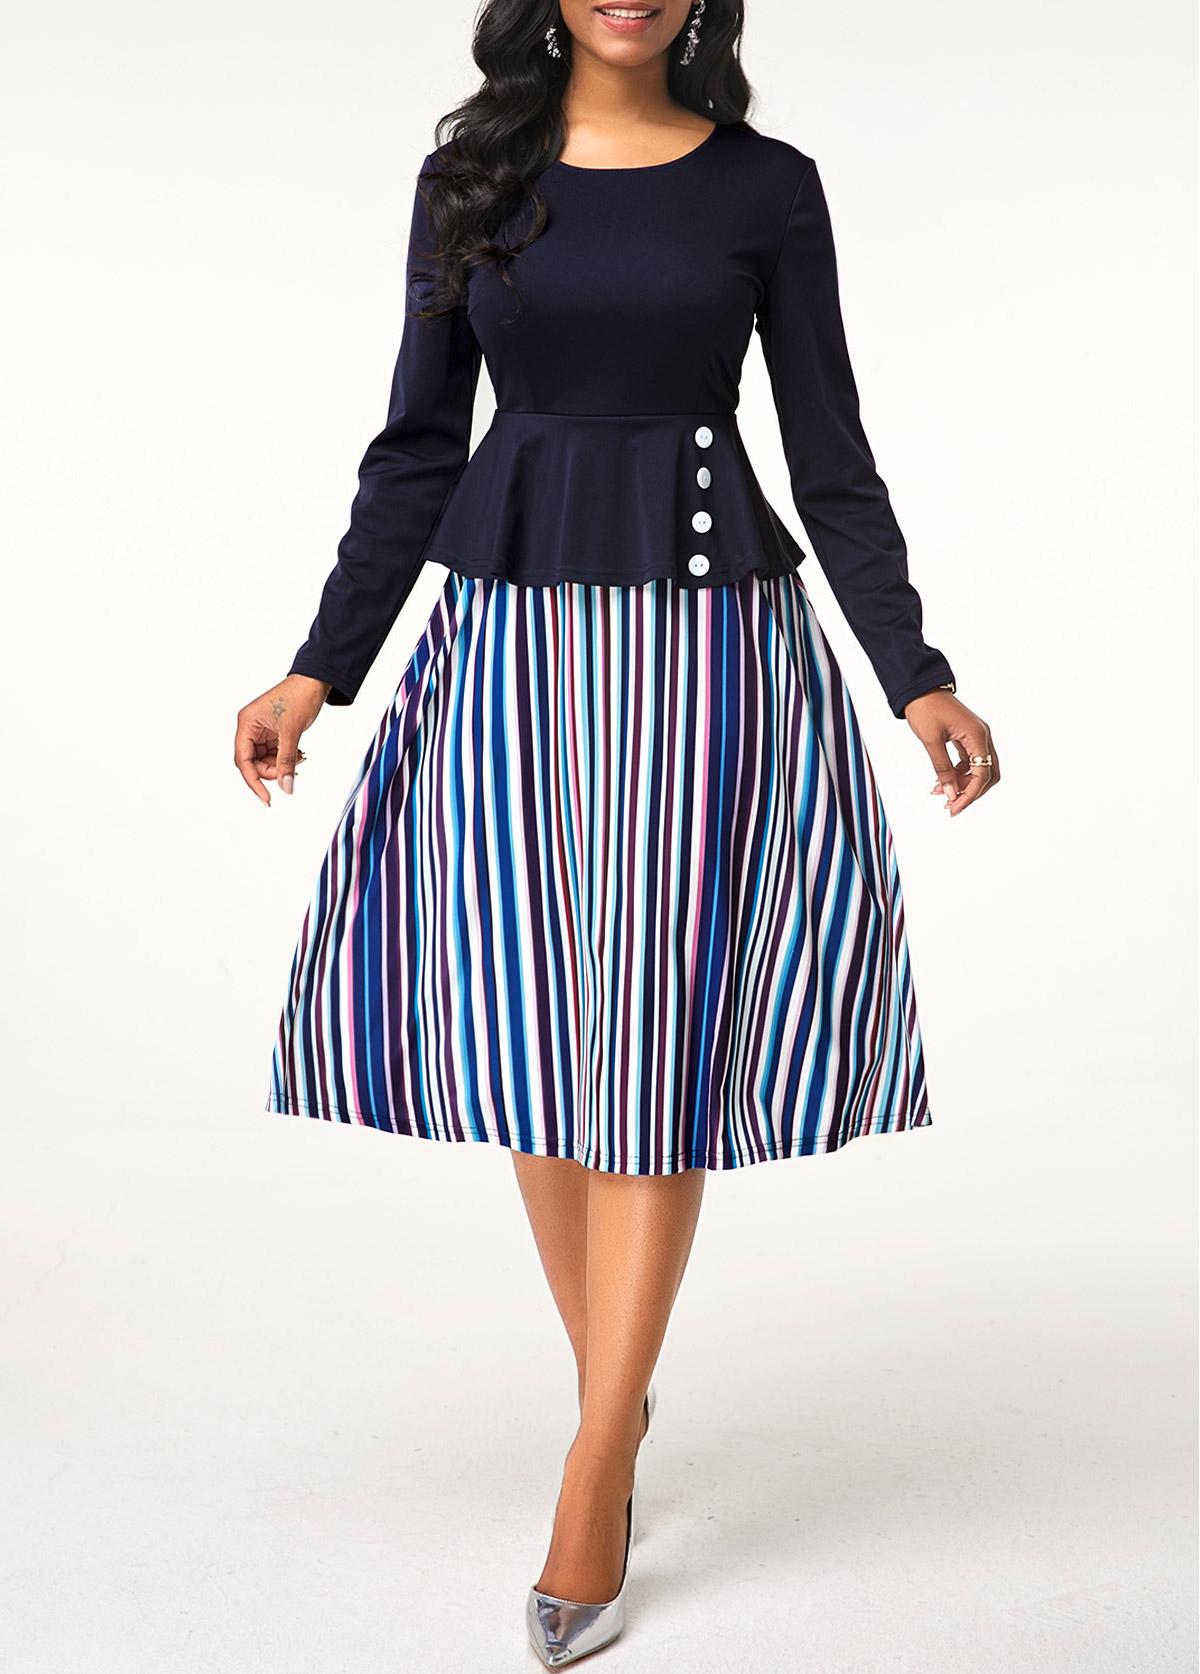 Stripe Print Round Neck Button Detail Dress